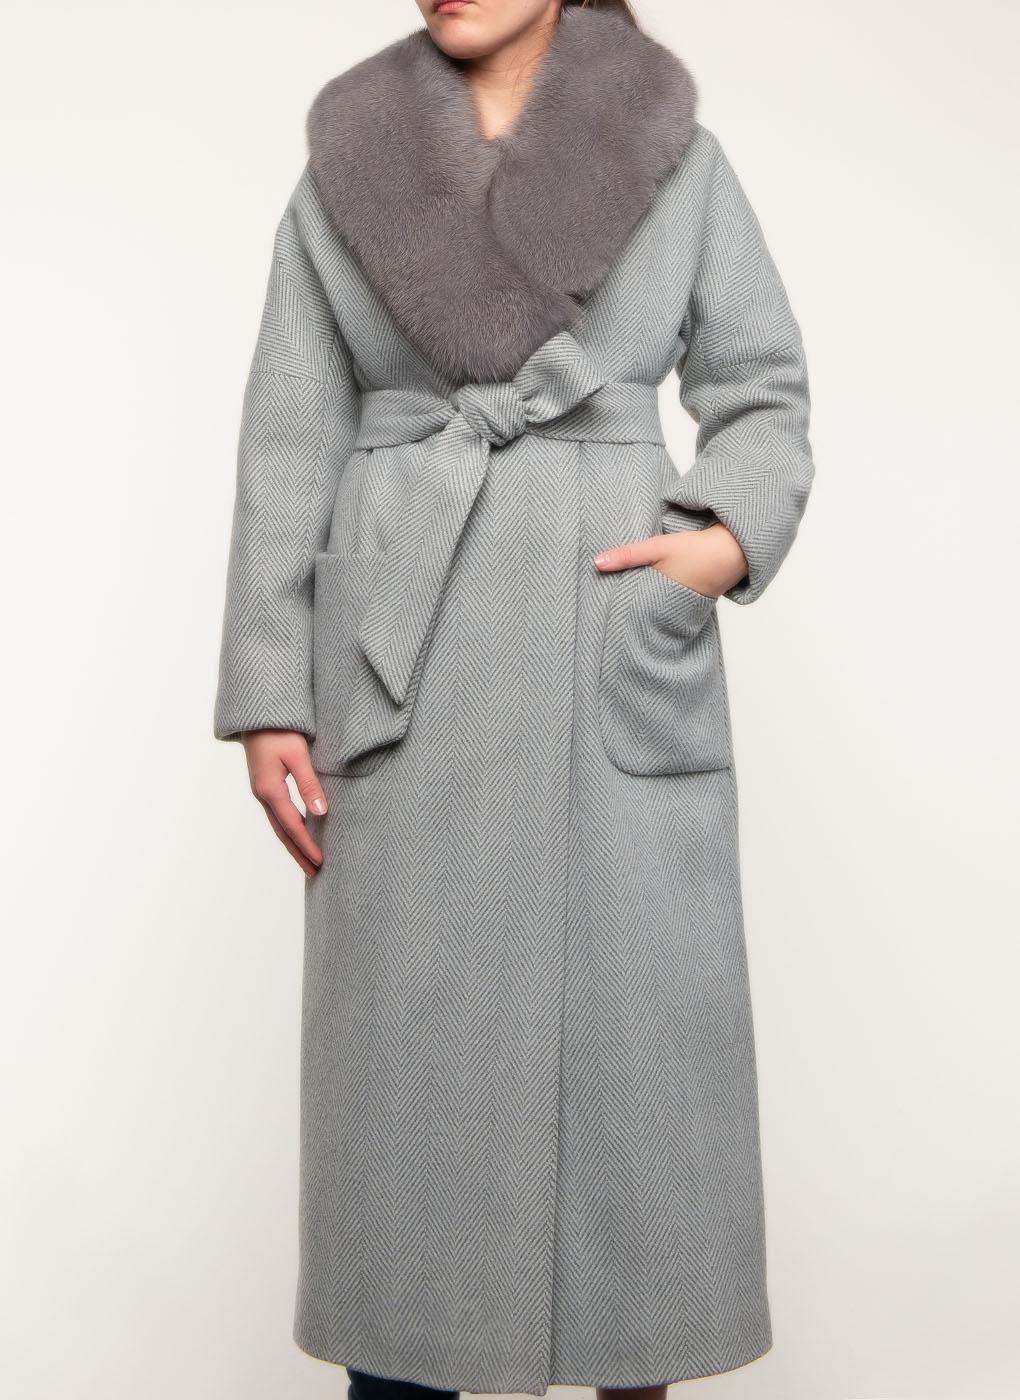 Пальто полушерстяное 04, Sezalto фото